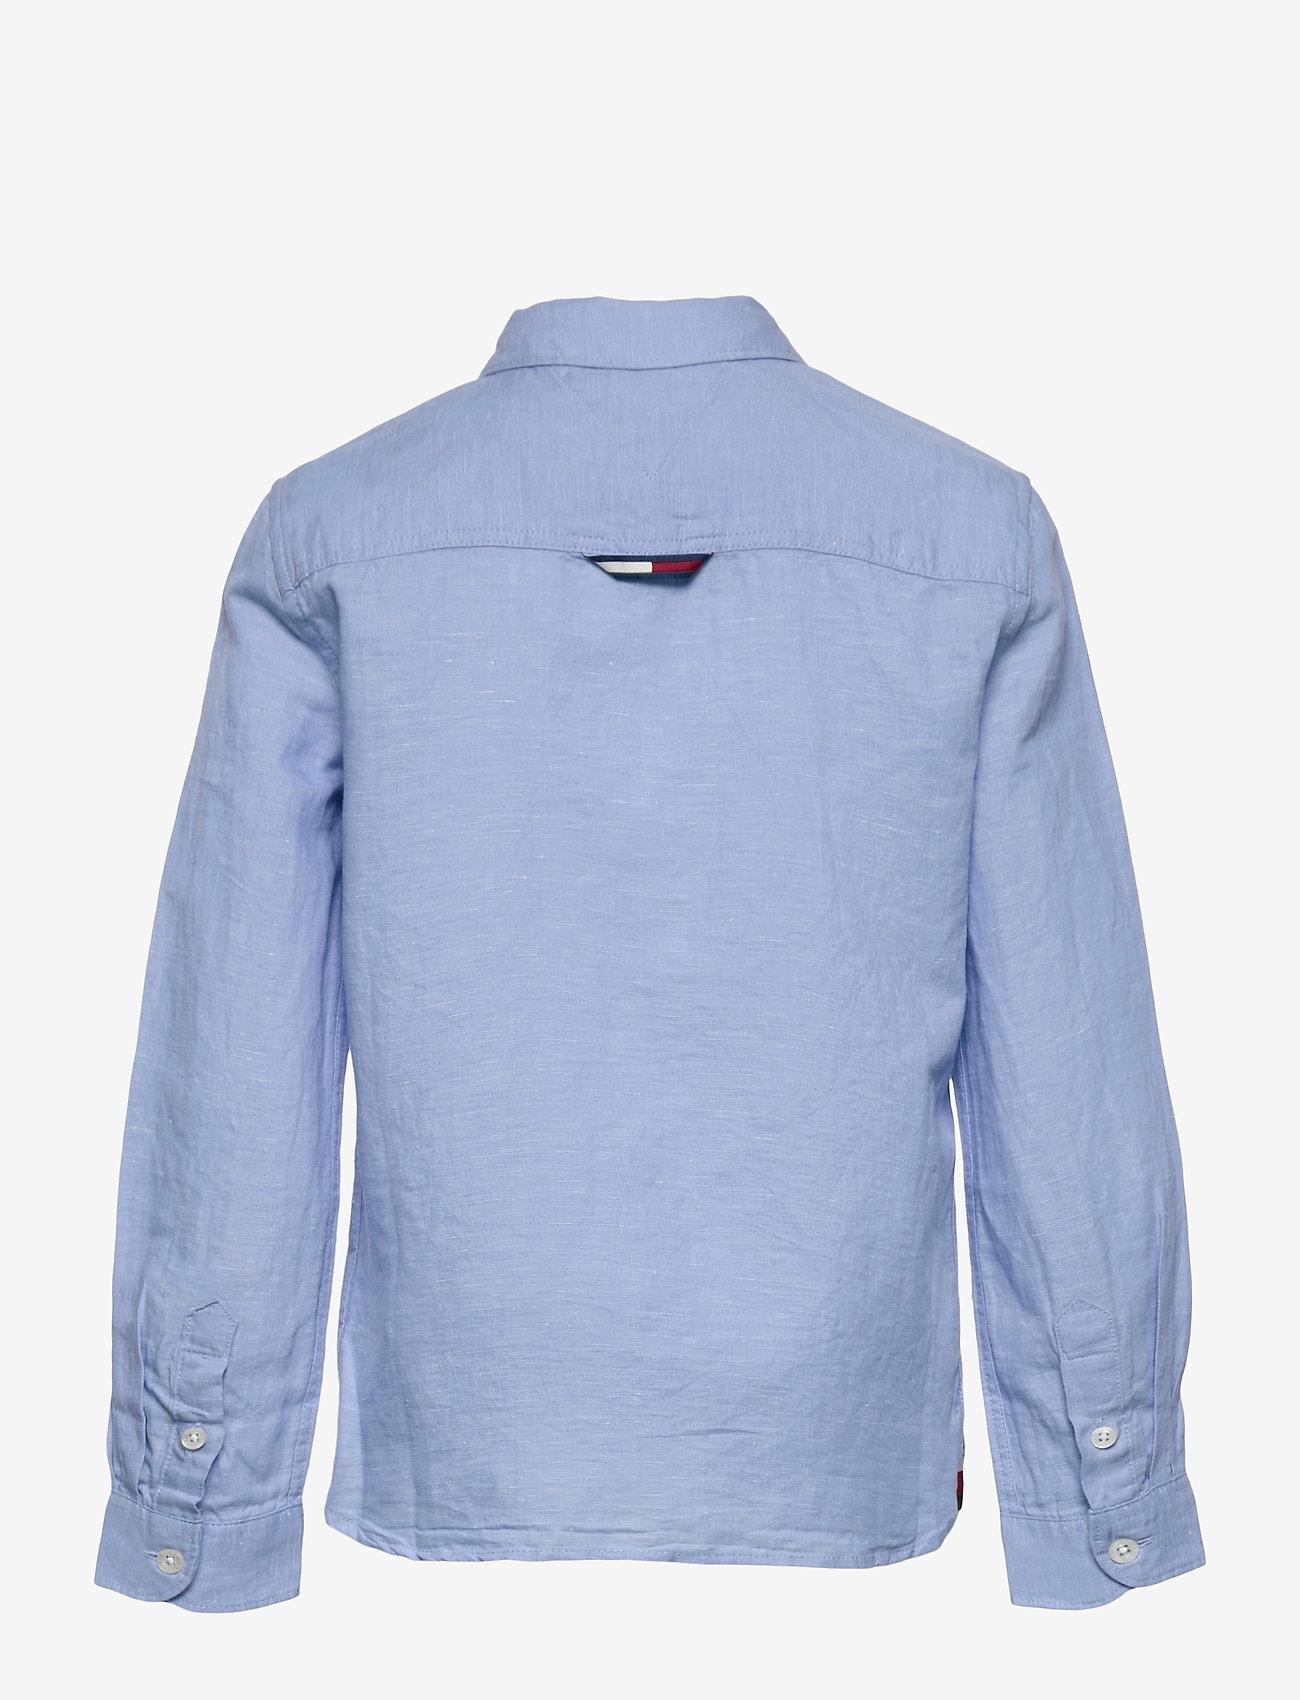 Tommy Hilfiger - ESSENTIAL COTTON LINEN SHIRT L/S - shirts - light blue - 1